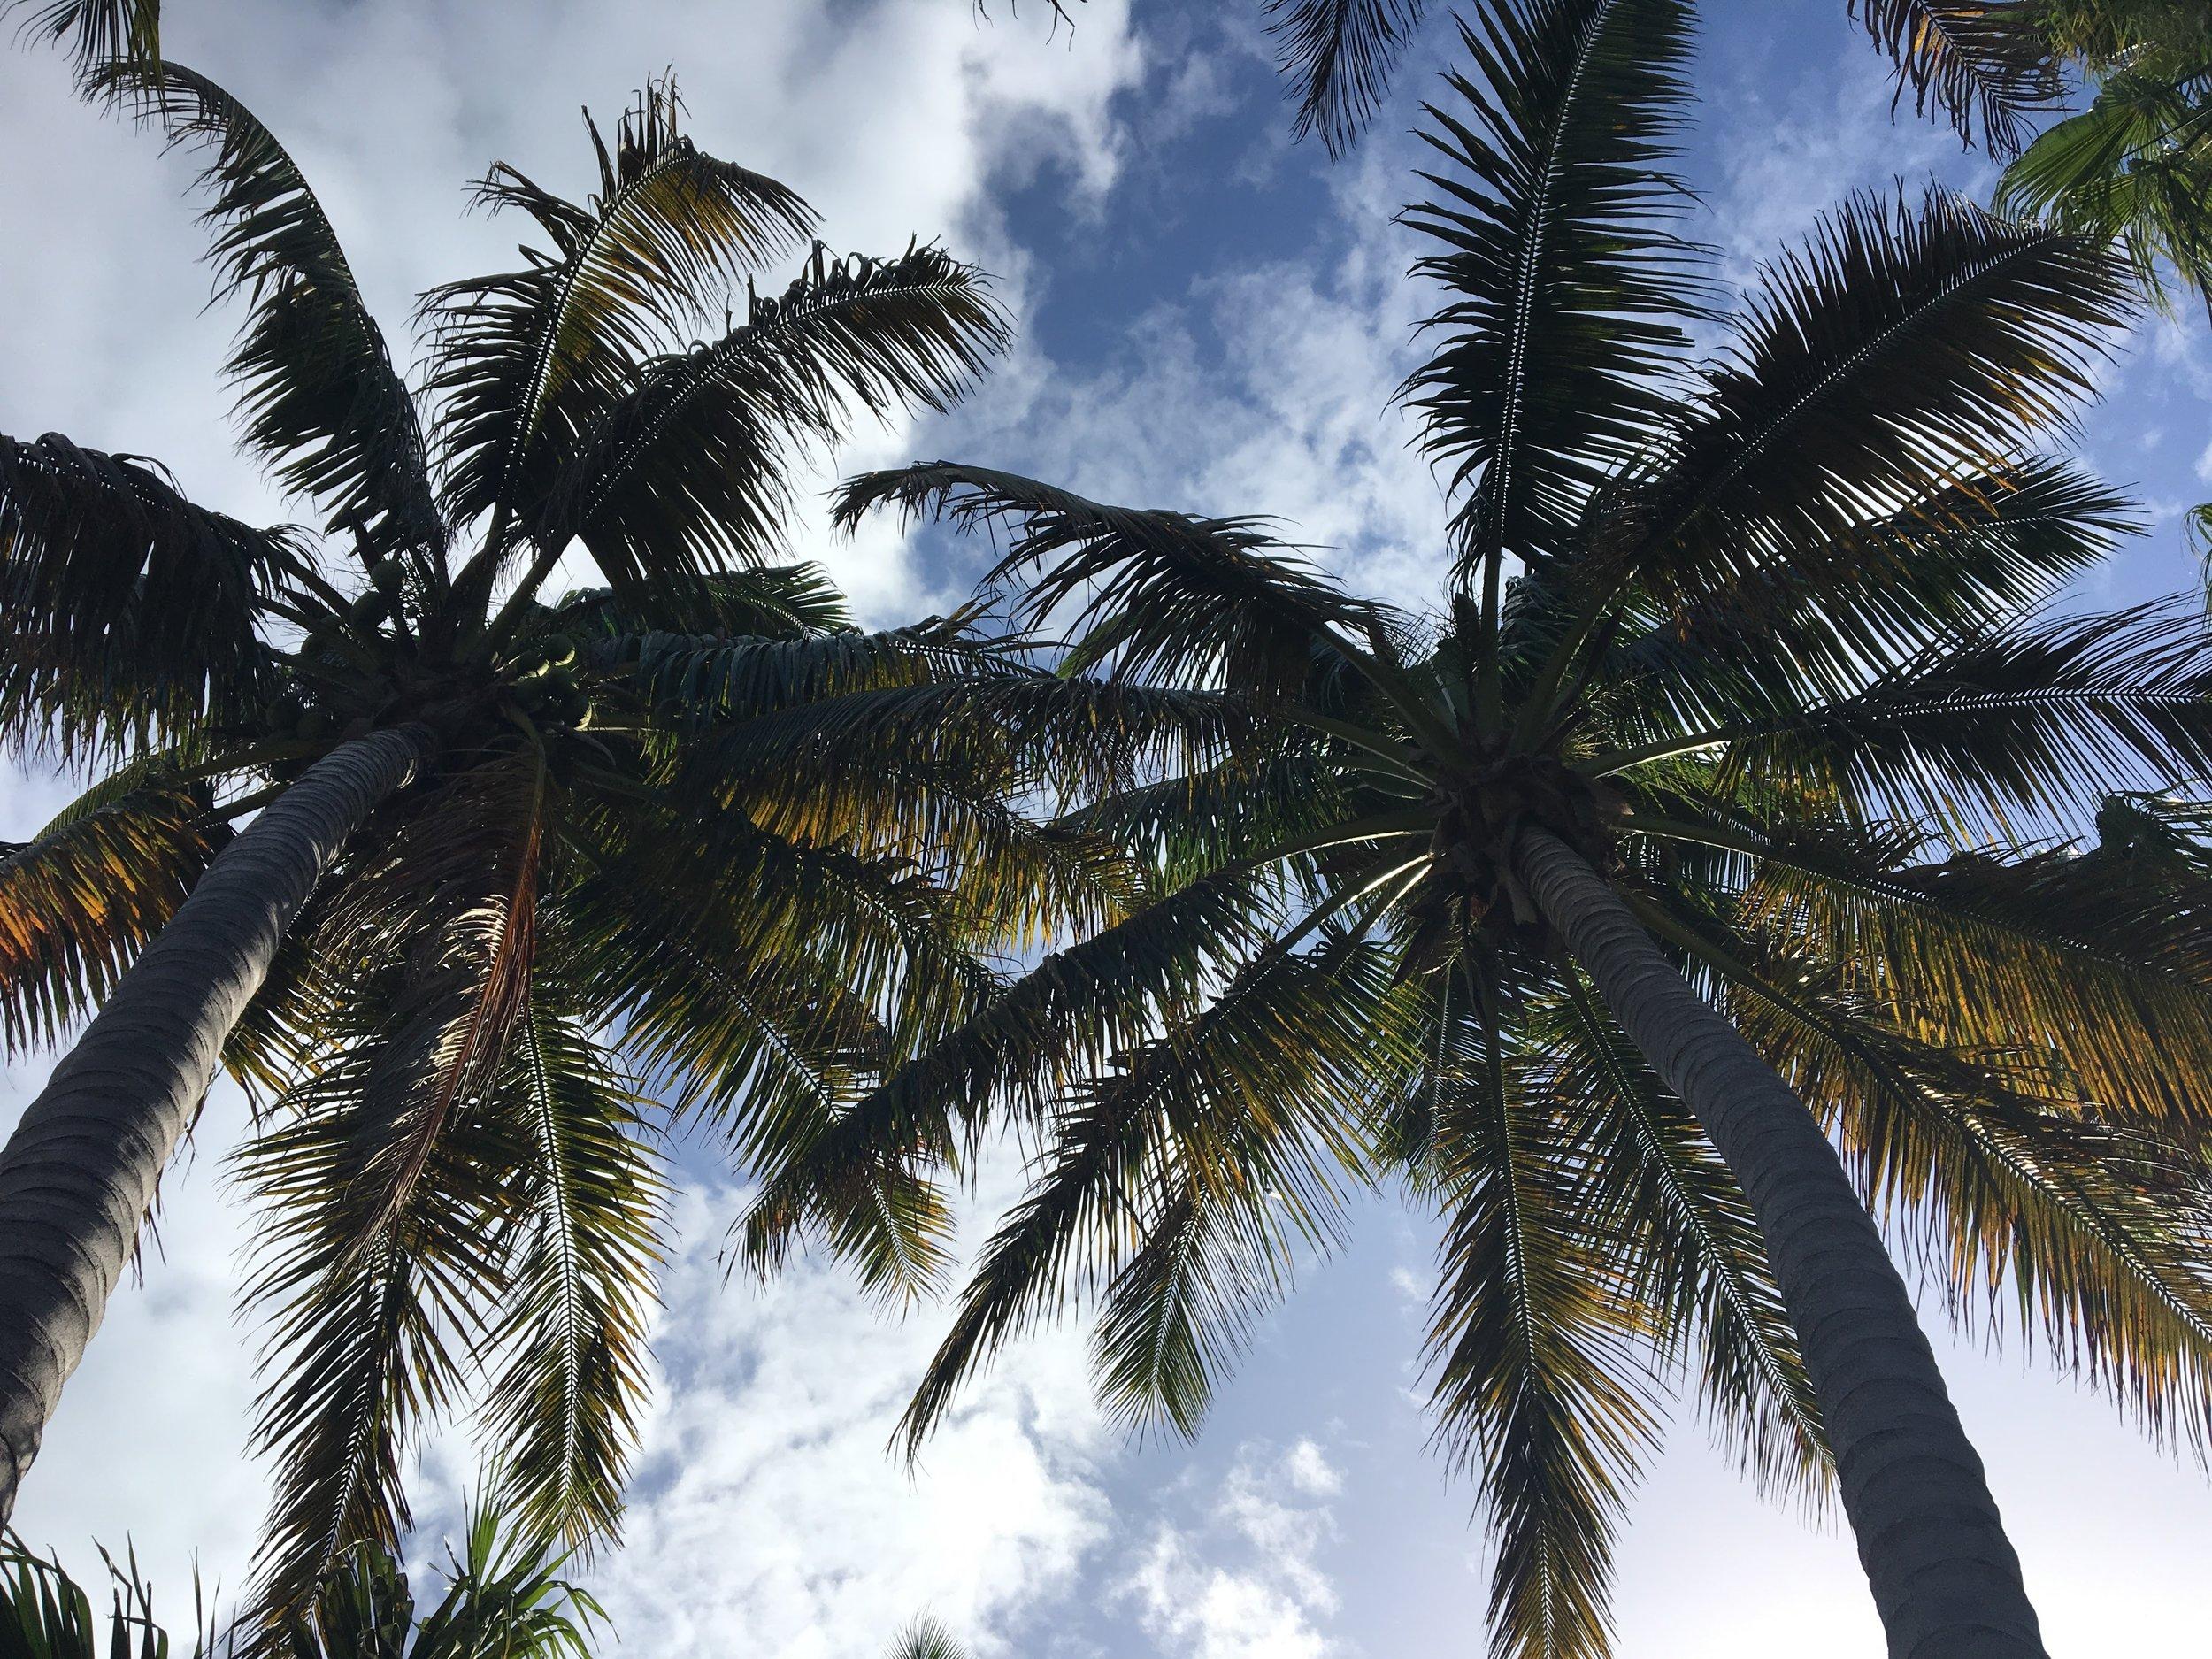 Turks&Caicos Palm Trees.JPG